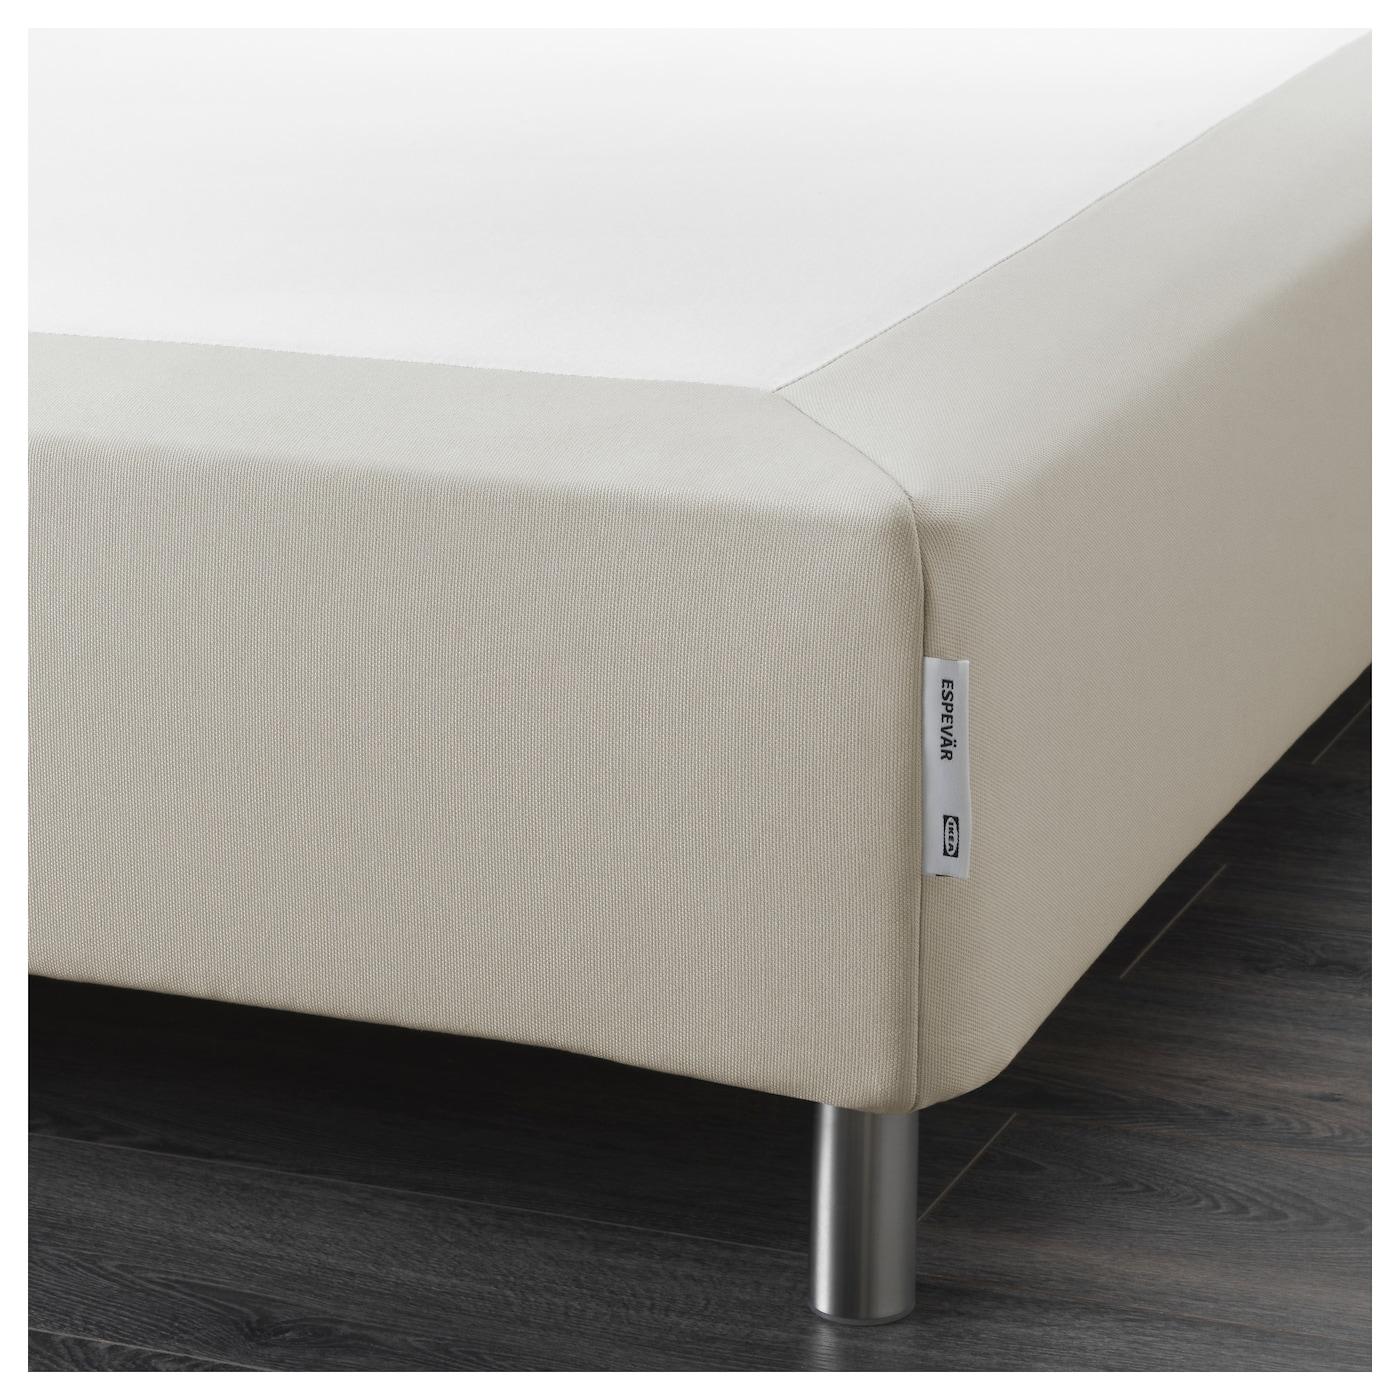 espev r sommier ressorts avec pieds beige 160x200 cm ikea. Black Bedroom Furniture Sets. Home Design Ideas